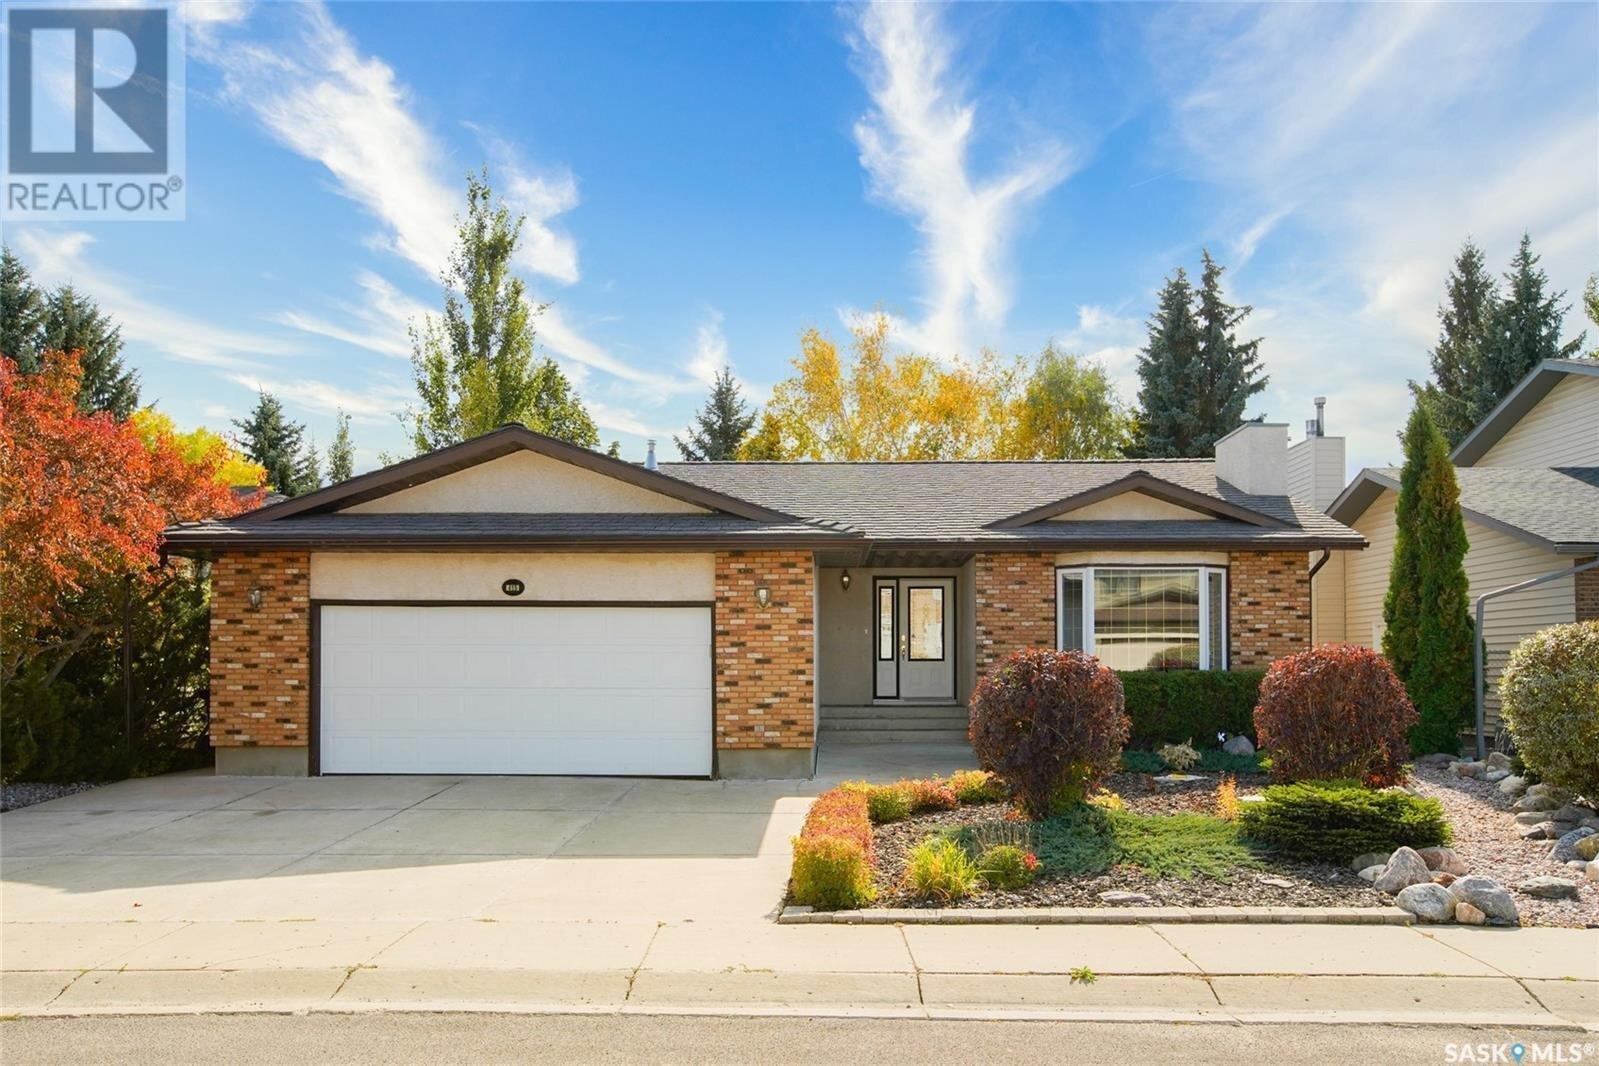 House for sale at 415 Mallin Cres Saskatoon Saskatchewan - MLS: SK834299